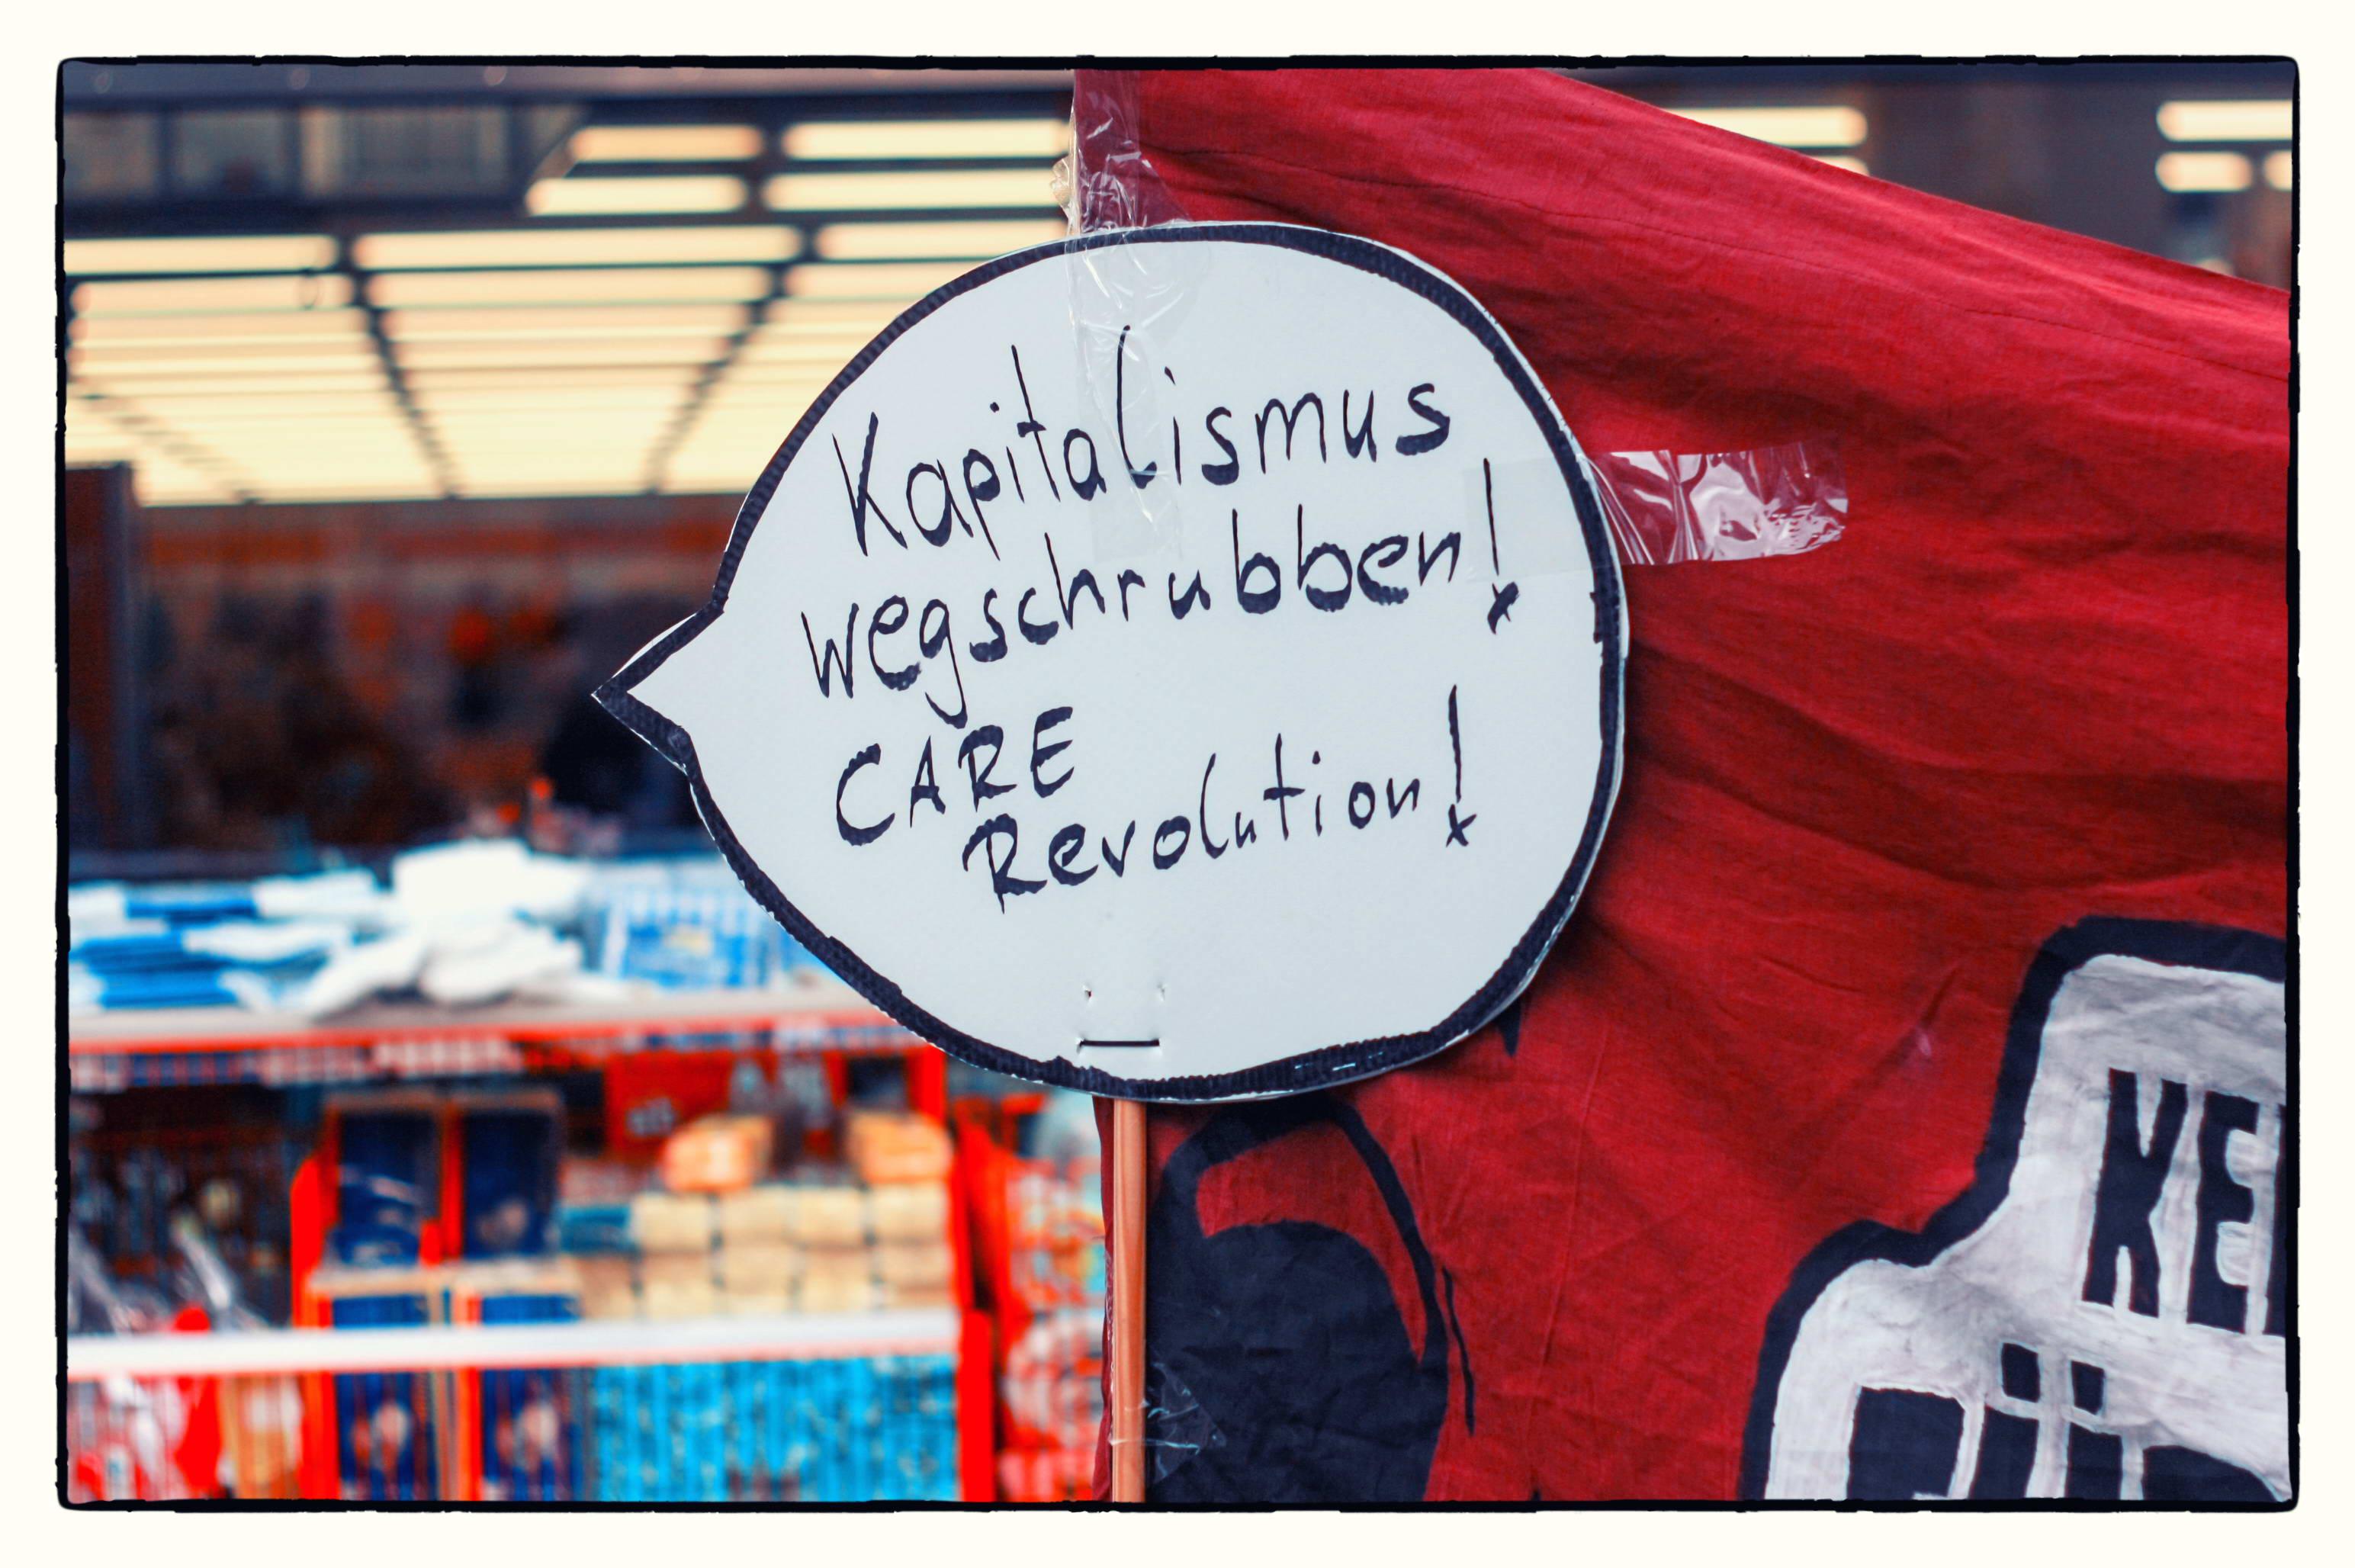 CareRevolution